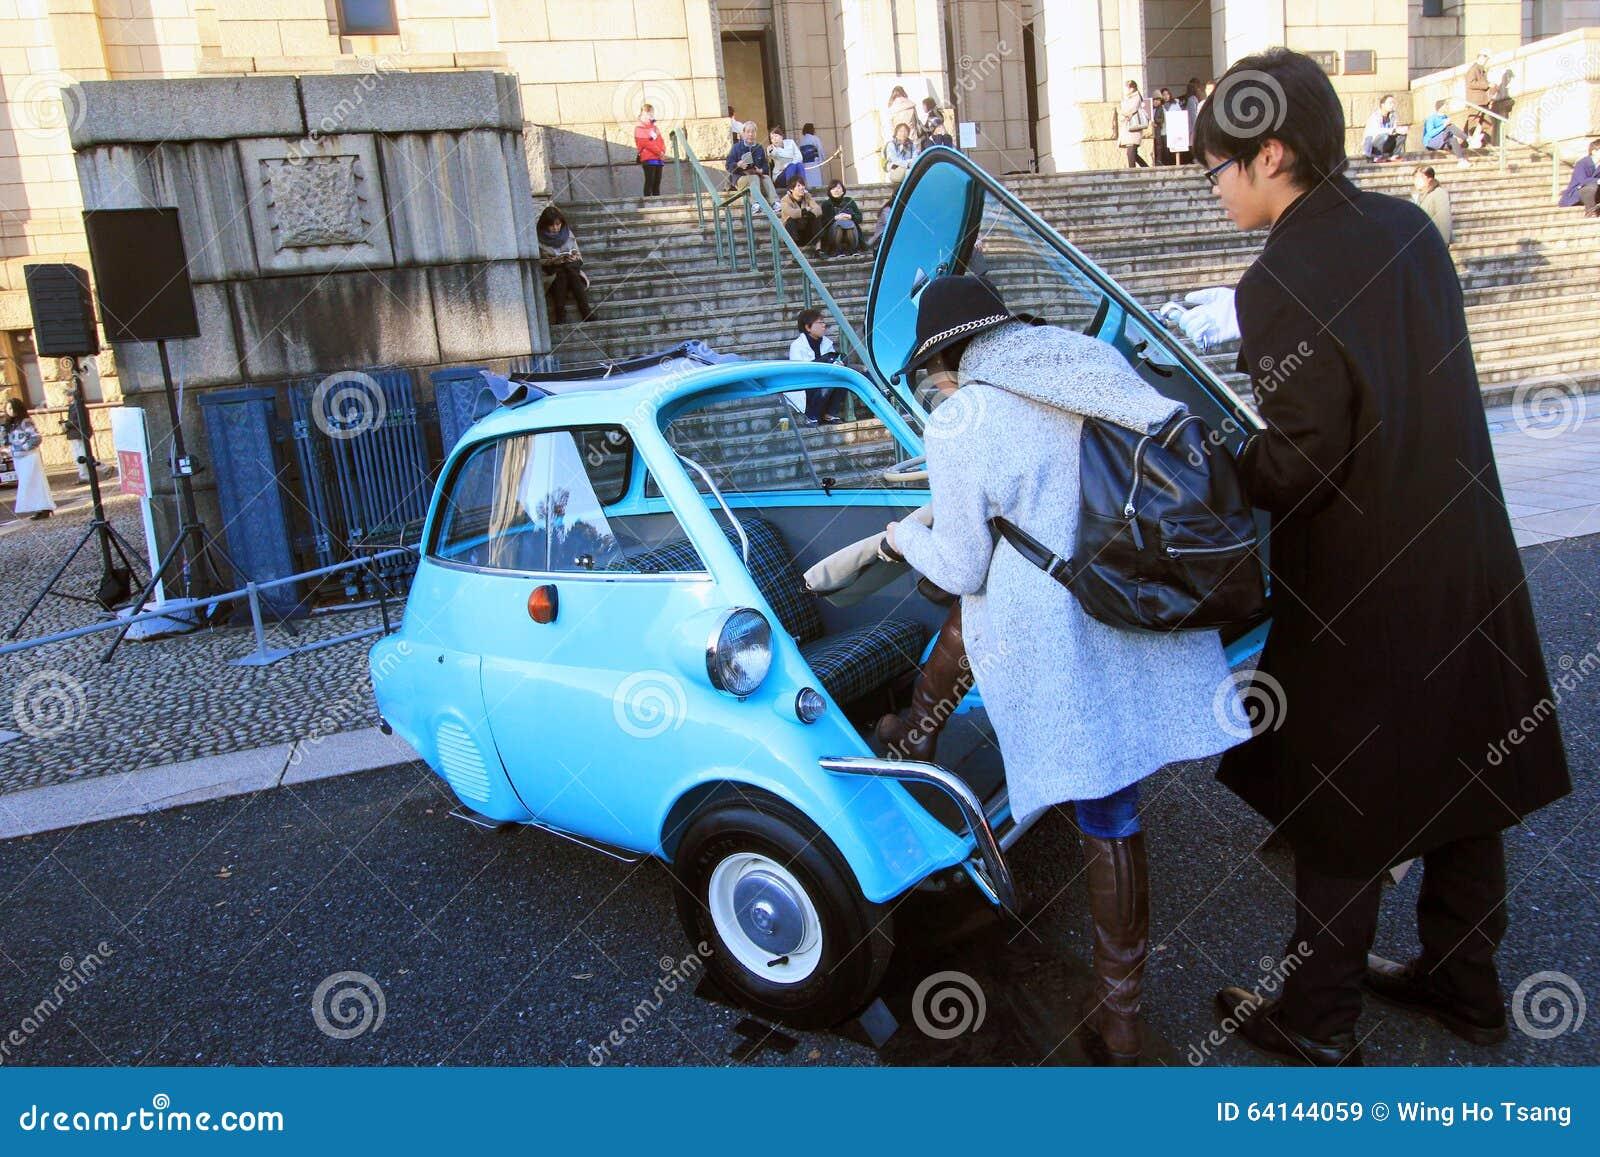 Tokyo Classic Car Festival In Japan Editorial Stock Image Image